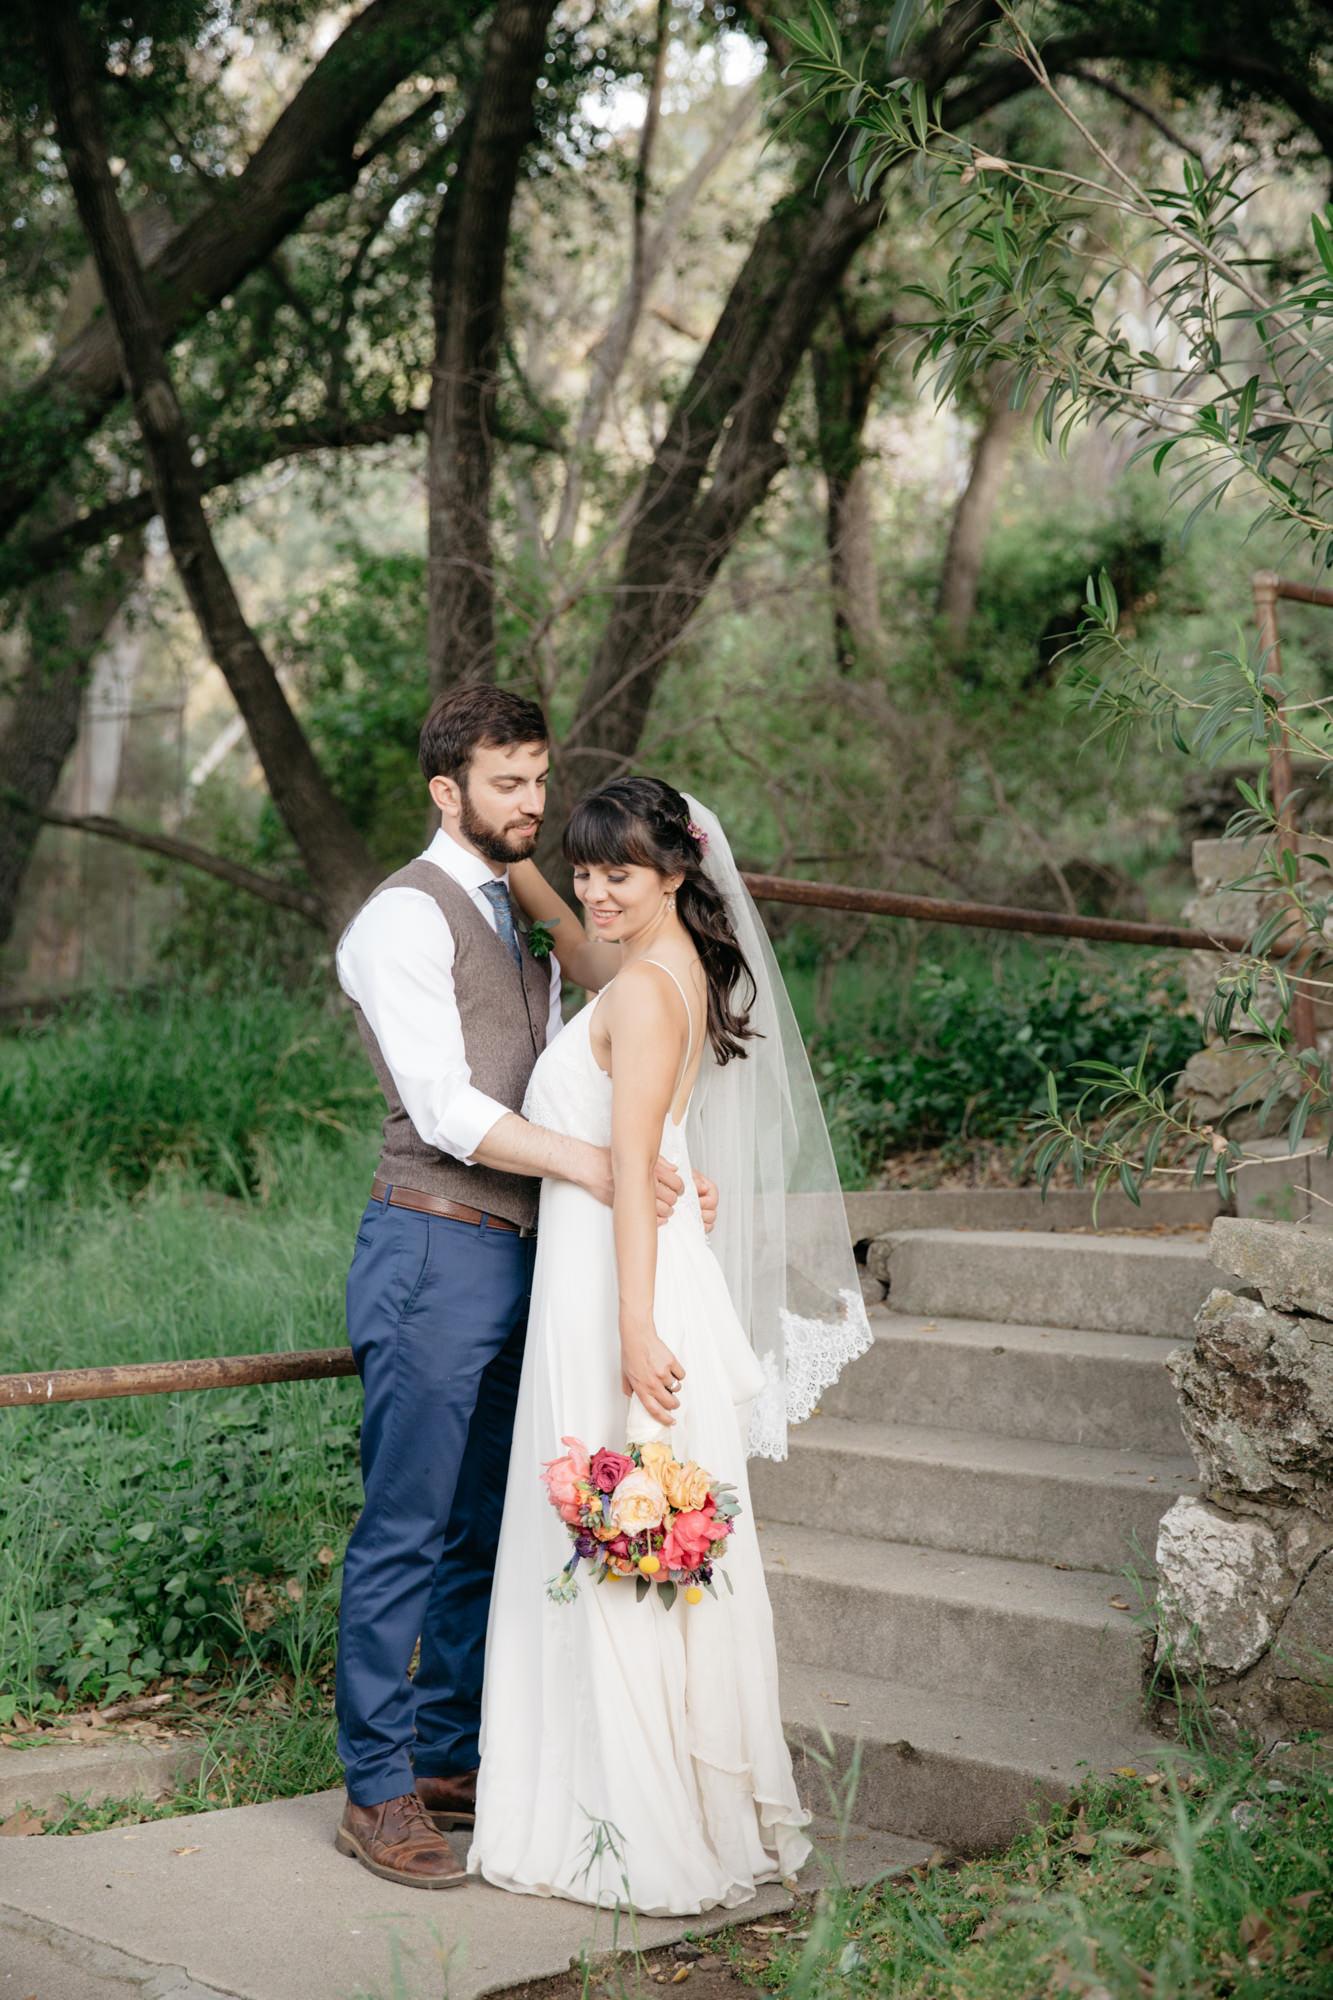 James and Chelsea by Jenna Pangan-100.jpg